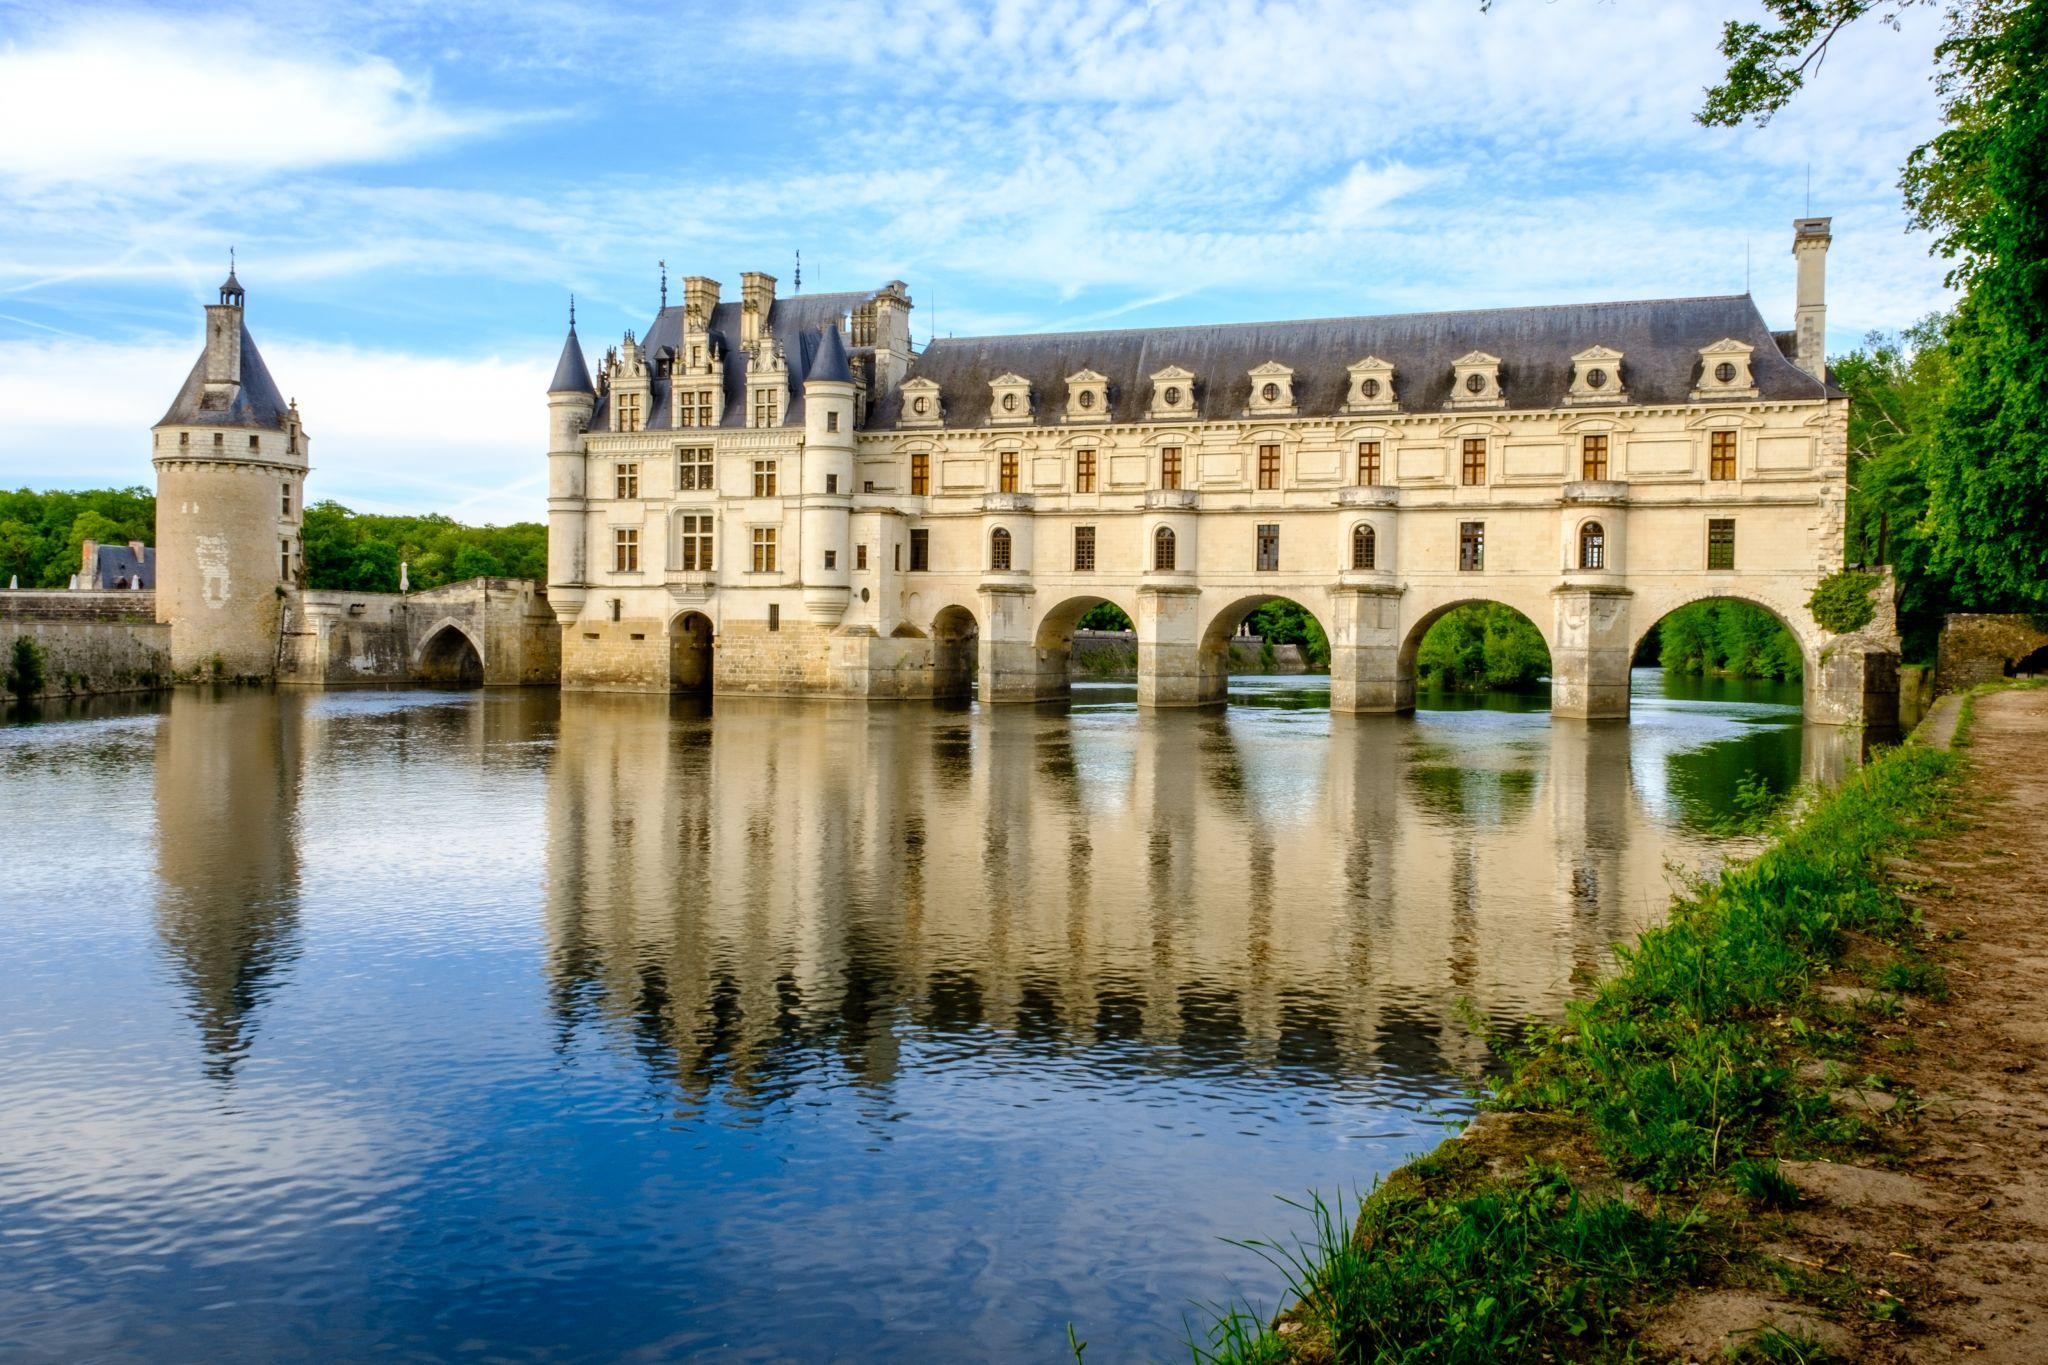 Beautiful view of Chateau de Chenonceau, France